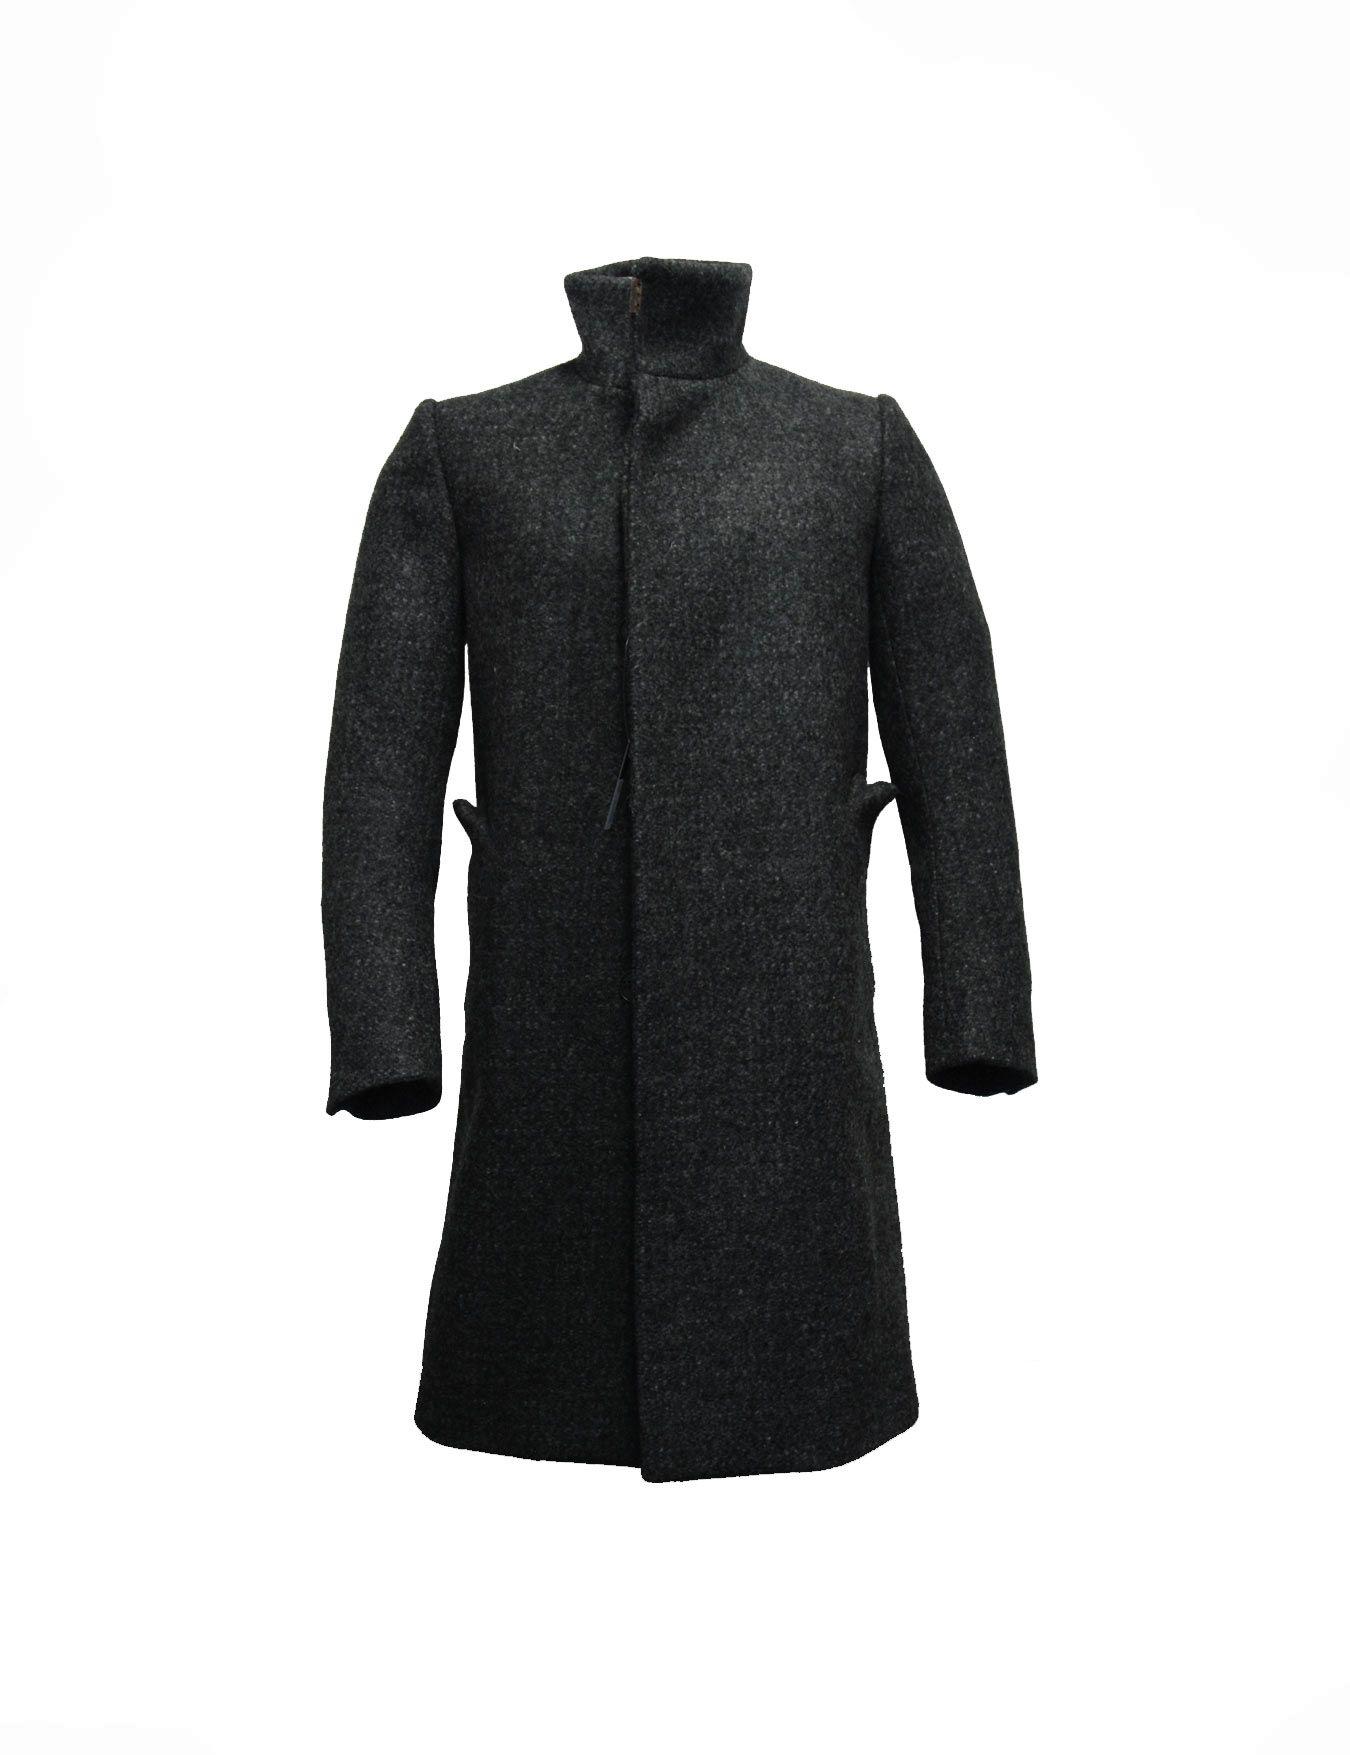 8a6aff73f Carol Christian Poell back raglan high neck coat. Grey color. Model: OM  2340L STEIN/9. Composizione: 100% virgin wool. Lining: 100% cotton.